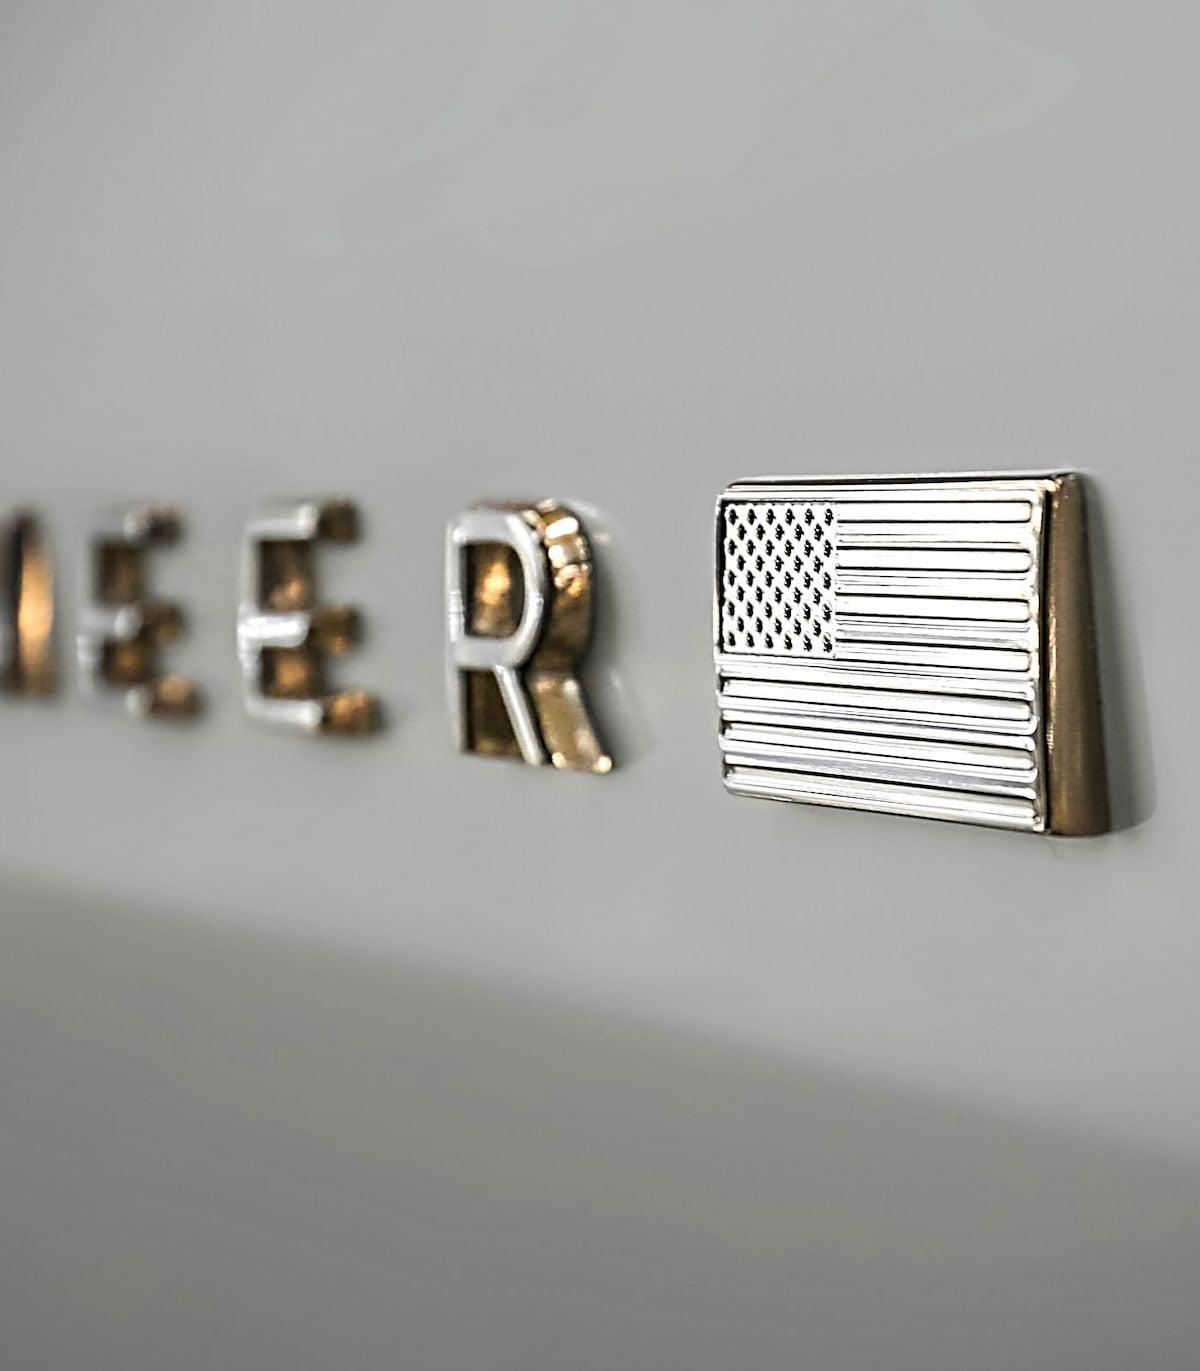 2022 Jeep Grand Wagoneer badge